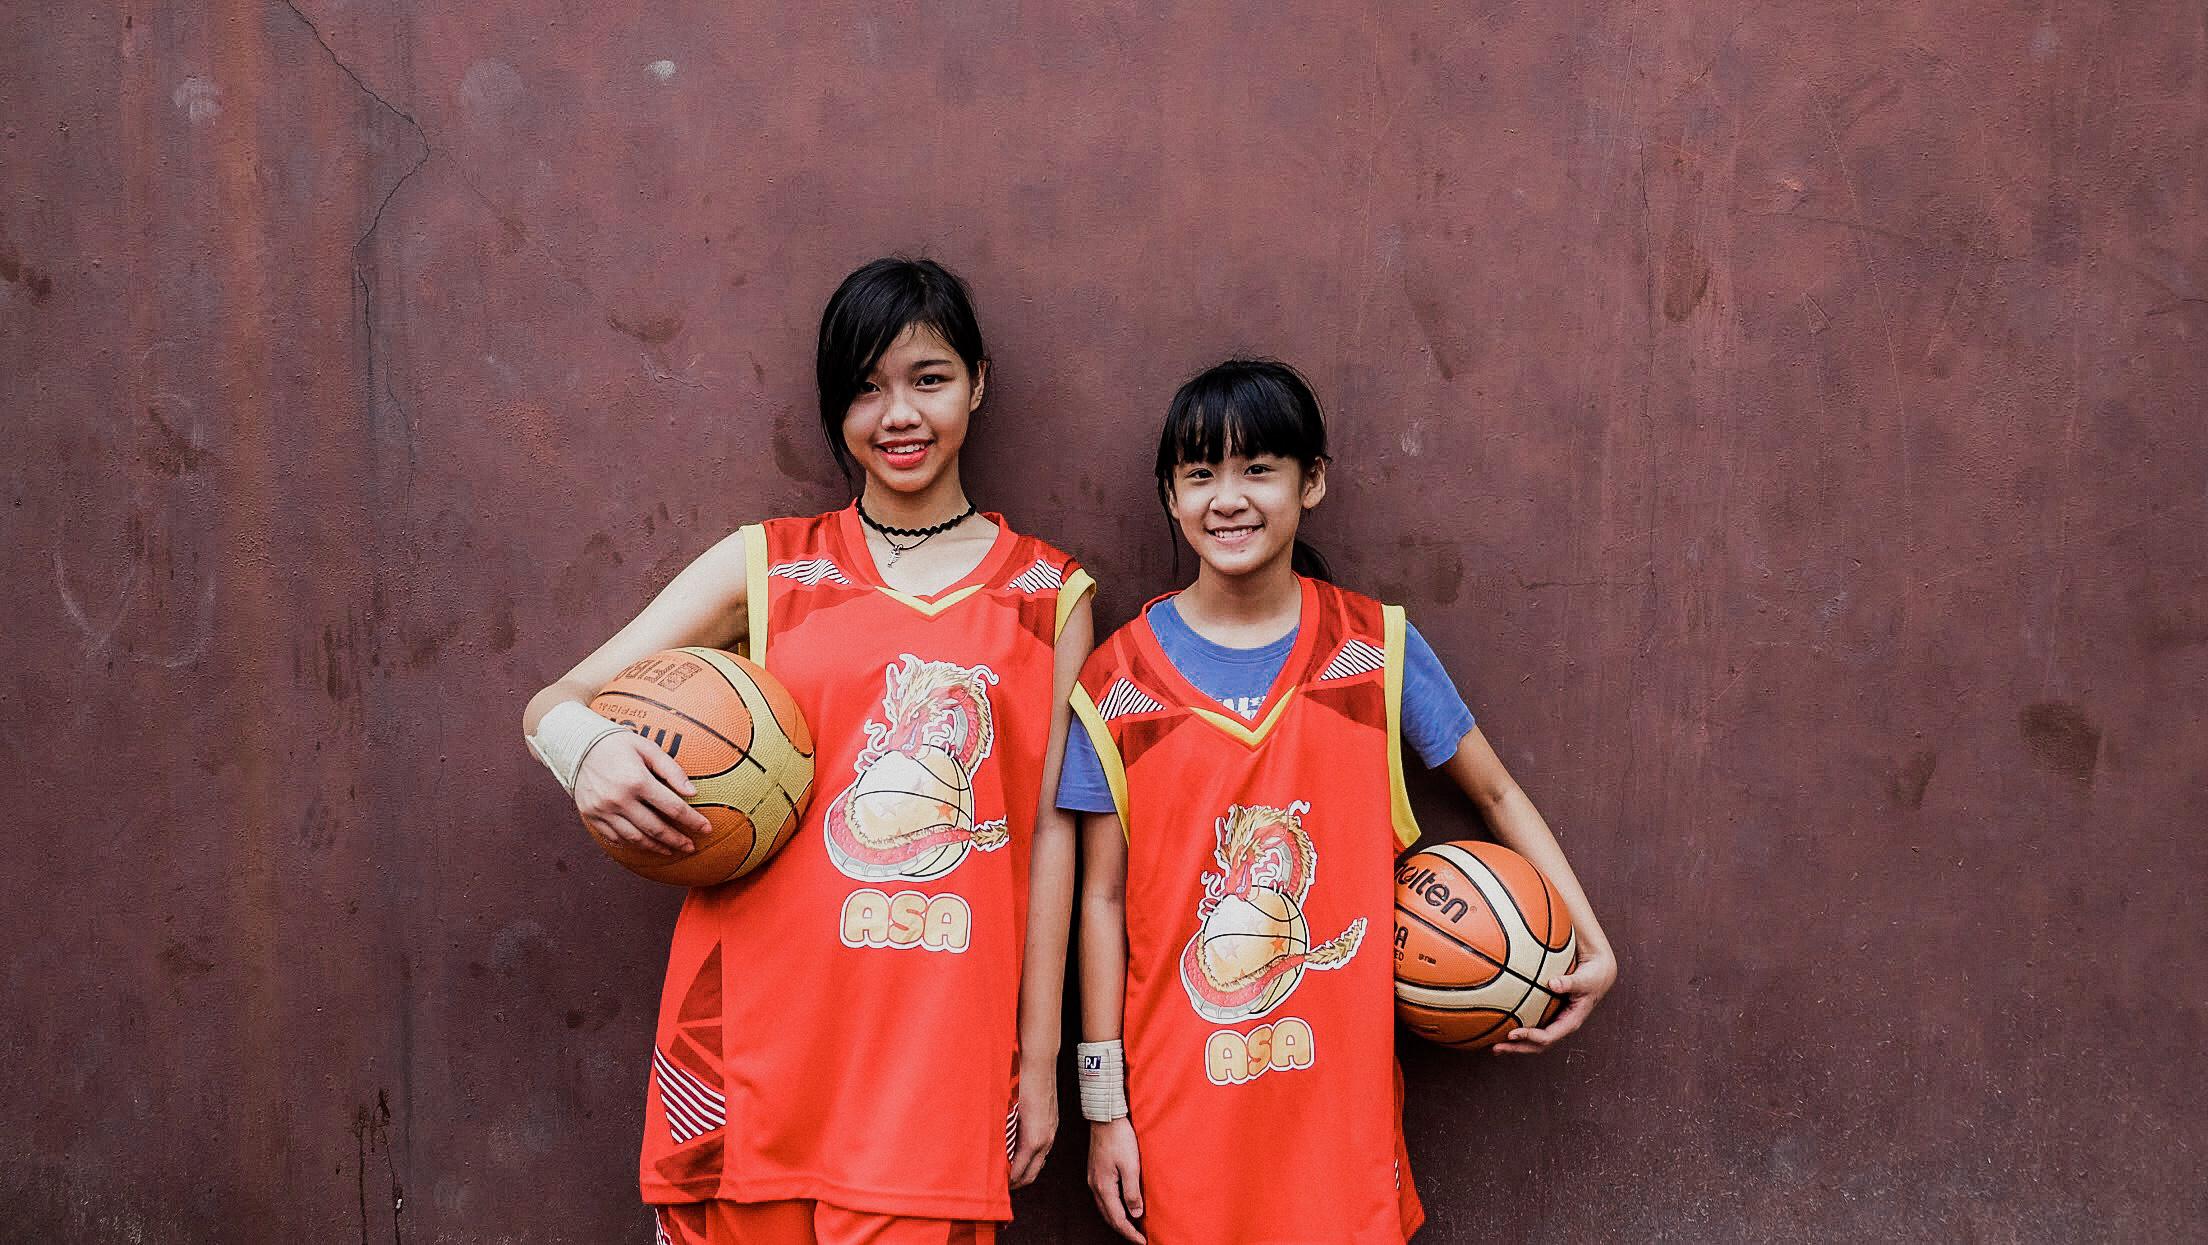 Blue Dragon-Children playing basketball (2)